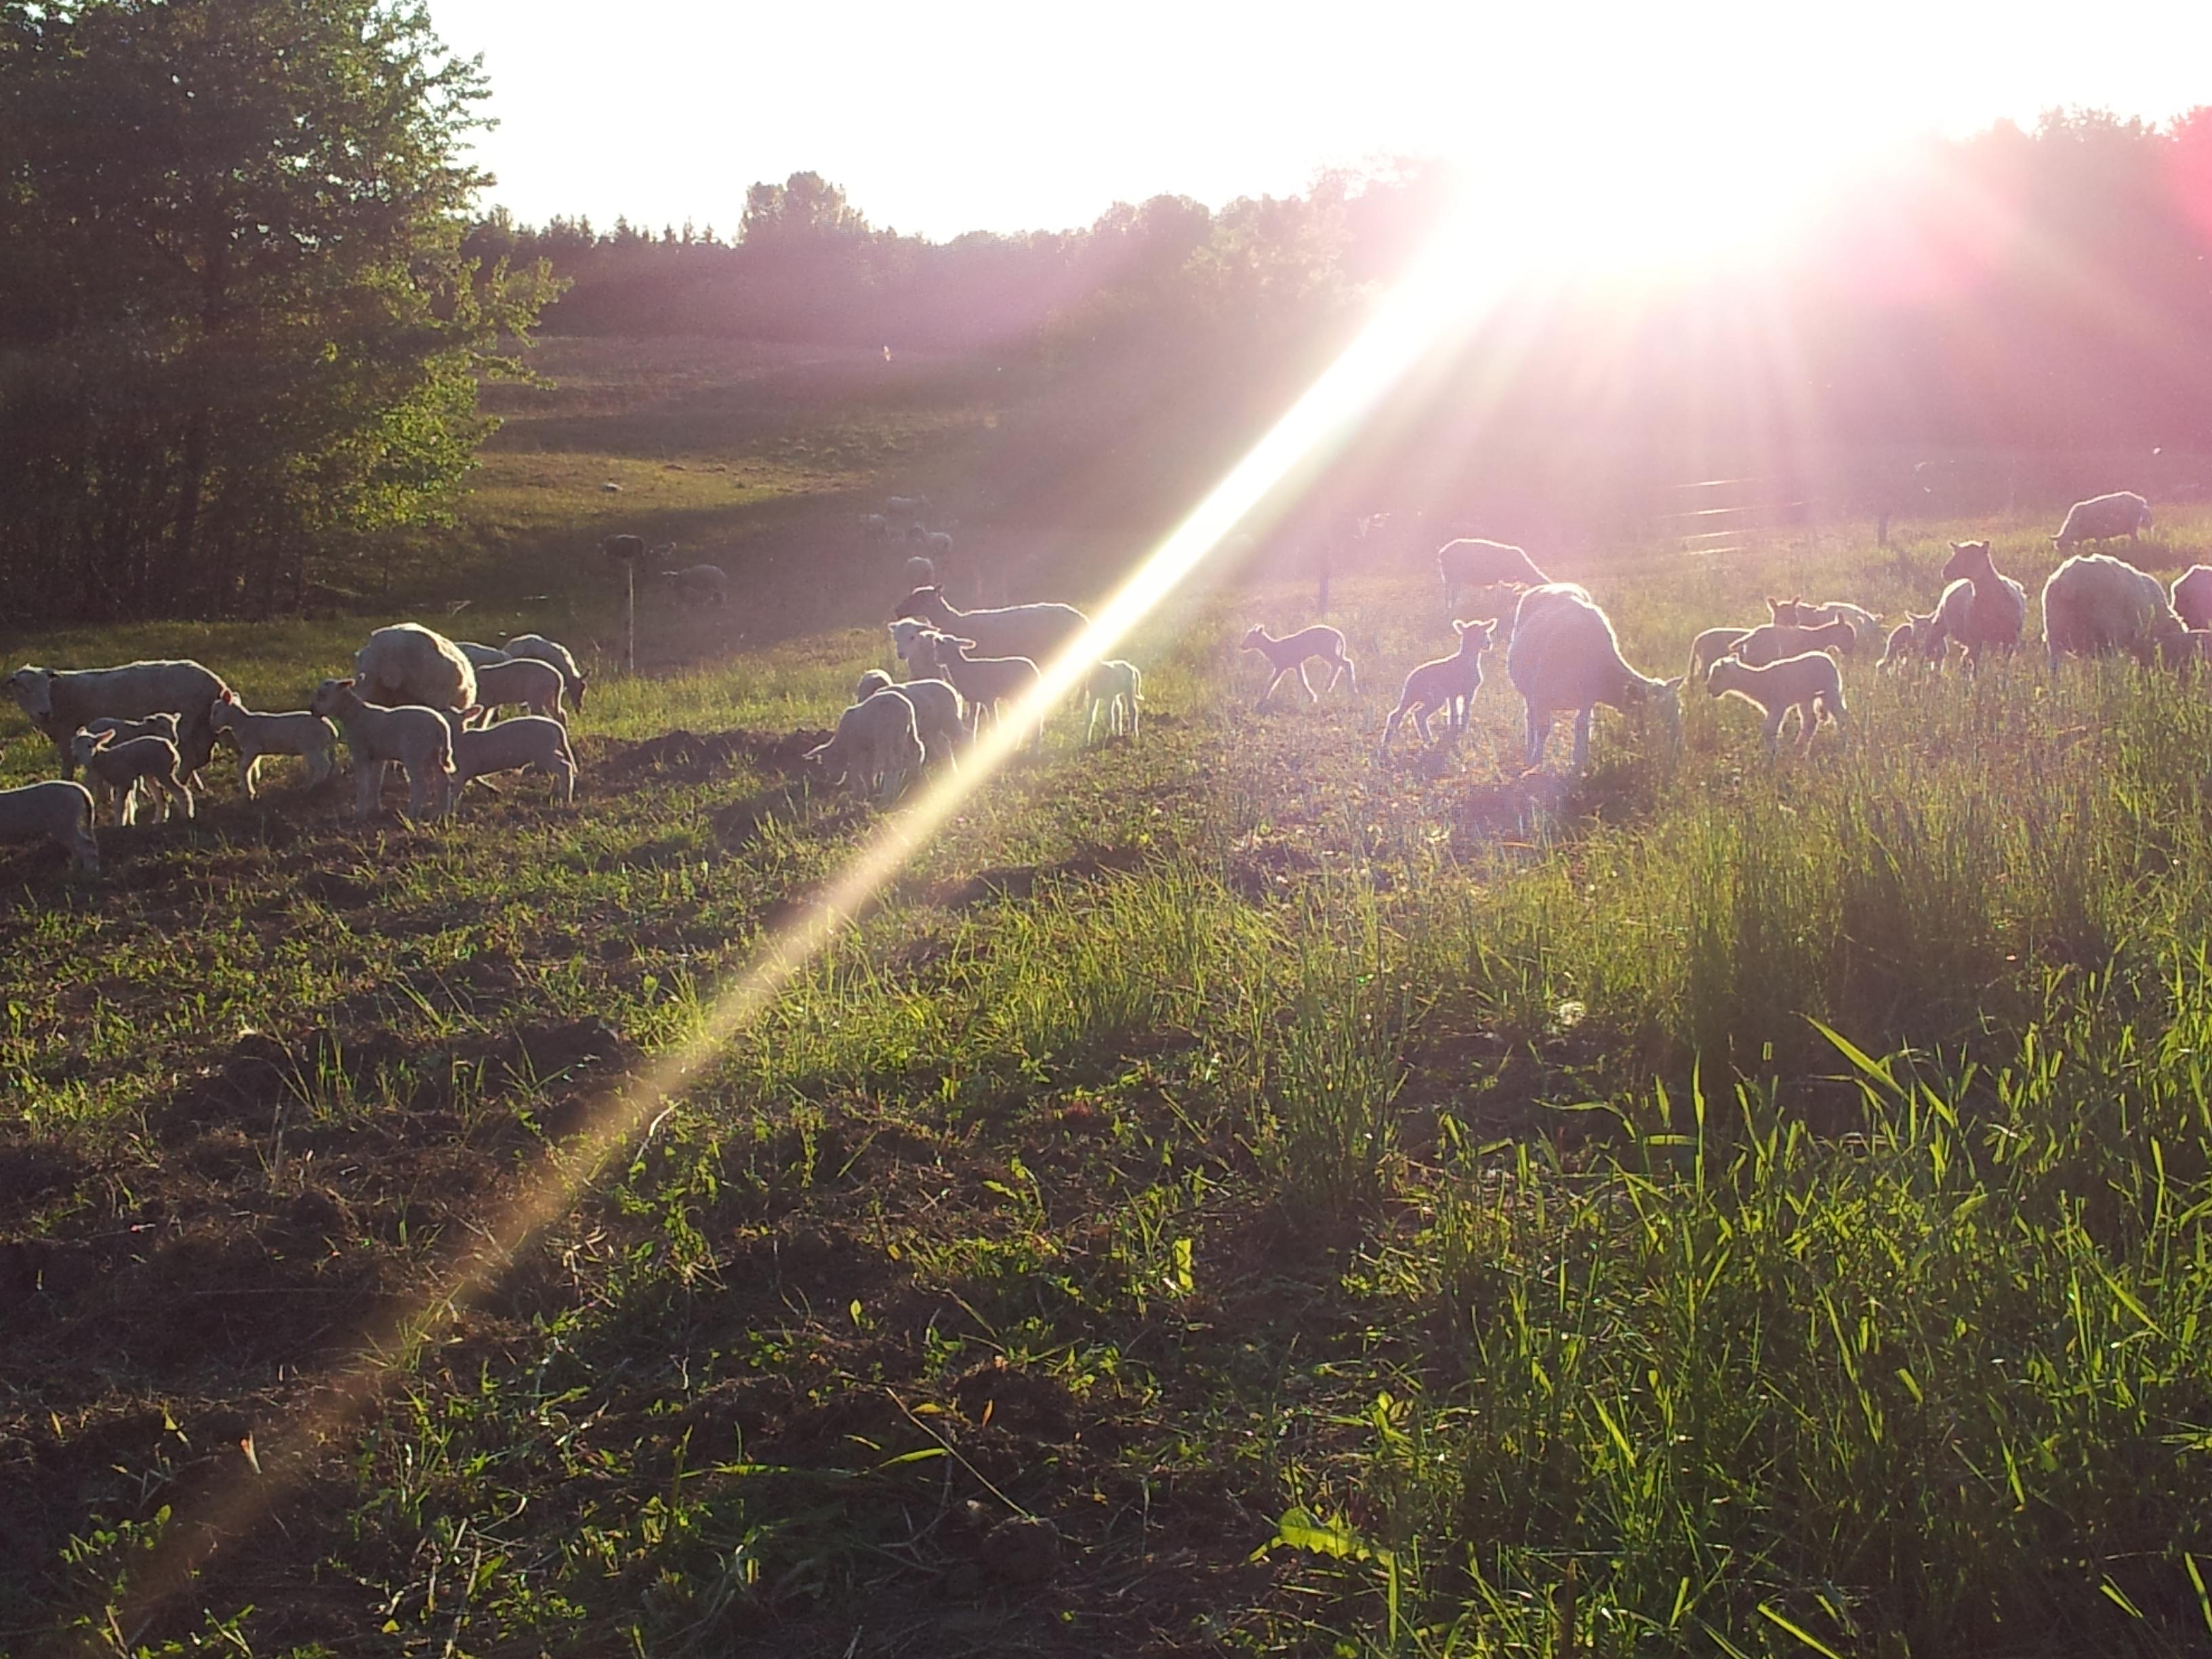 Lambing on grass